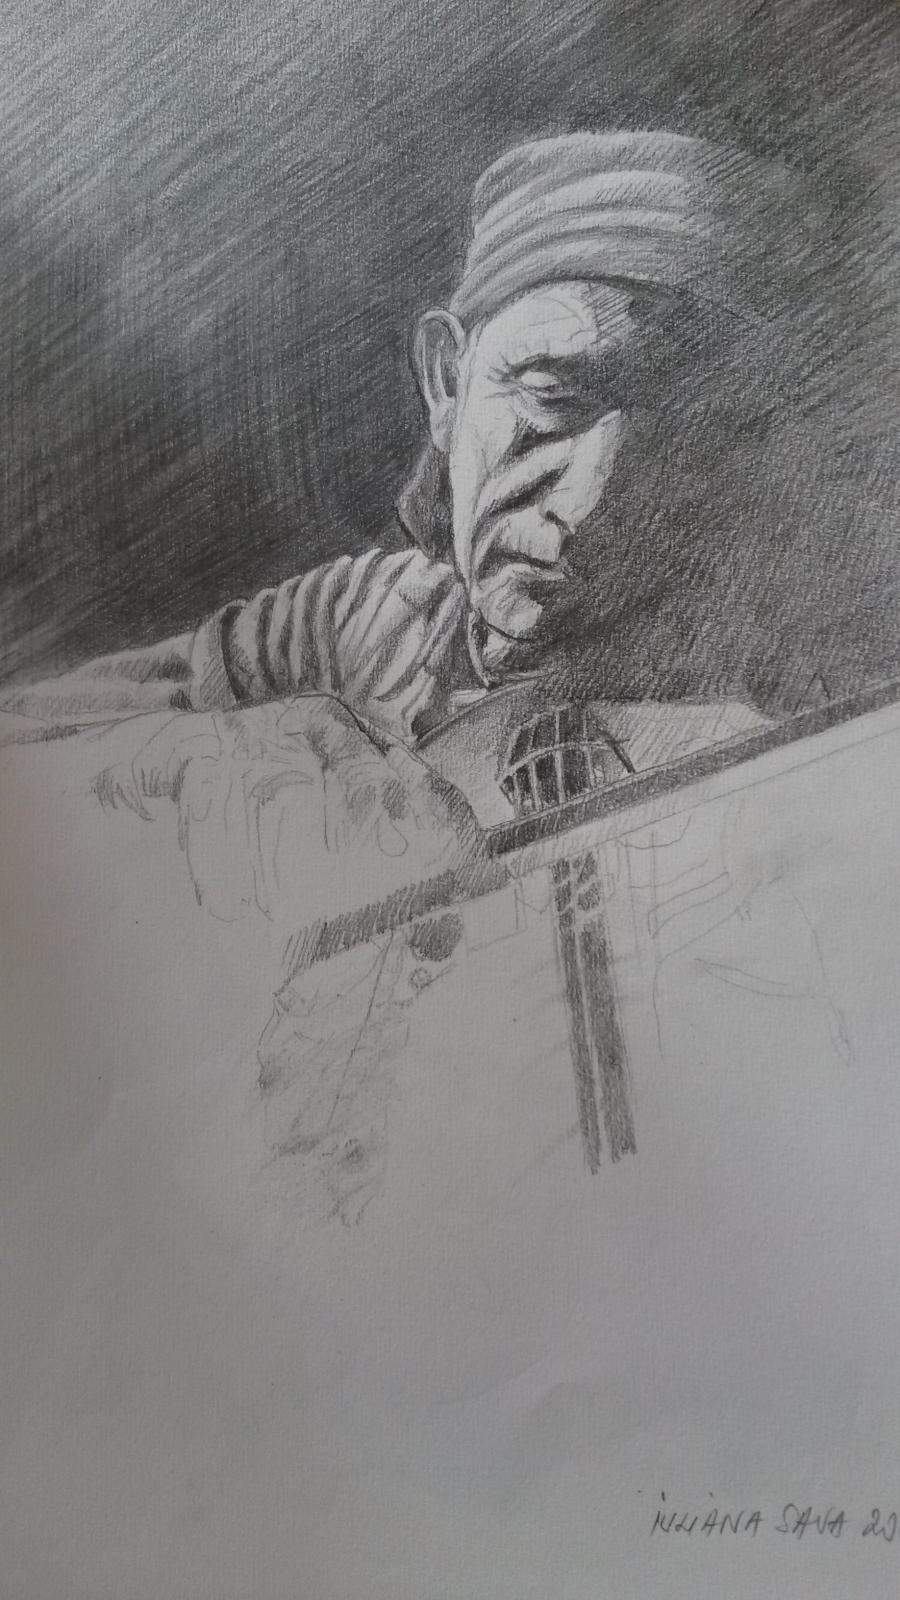 Picturi in creion / carbune scripcar cantand